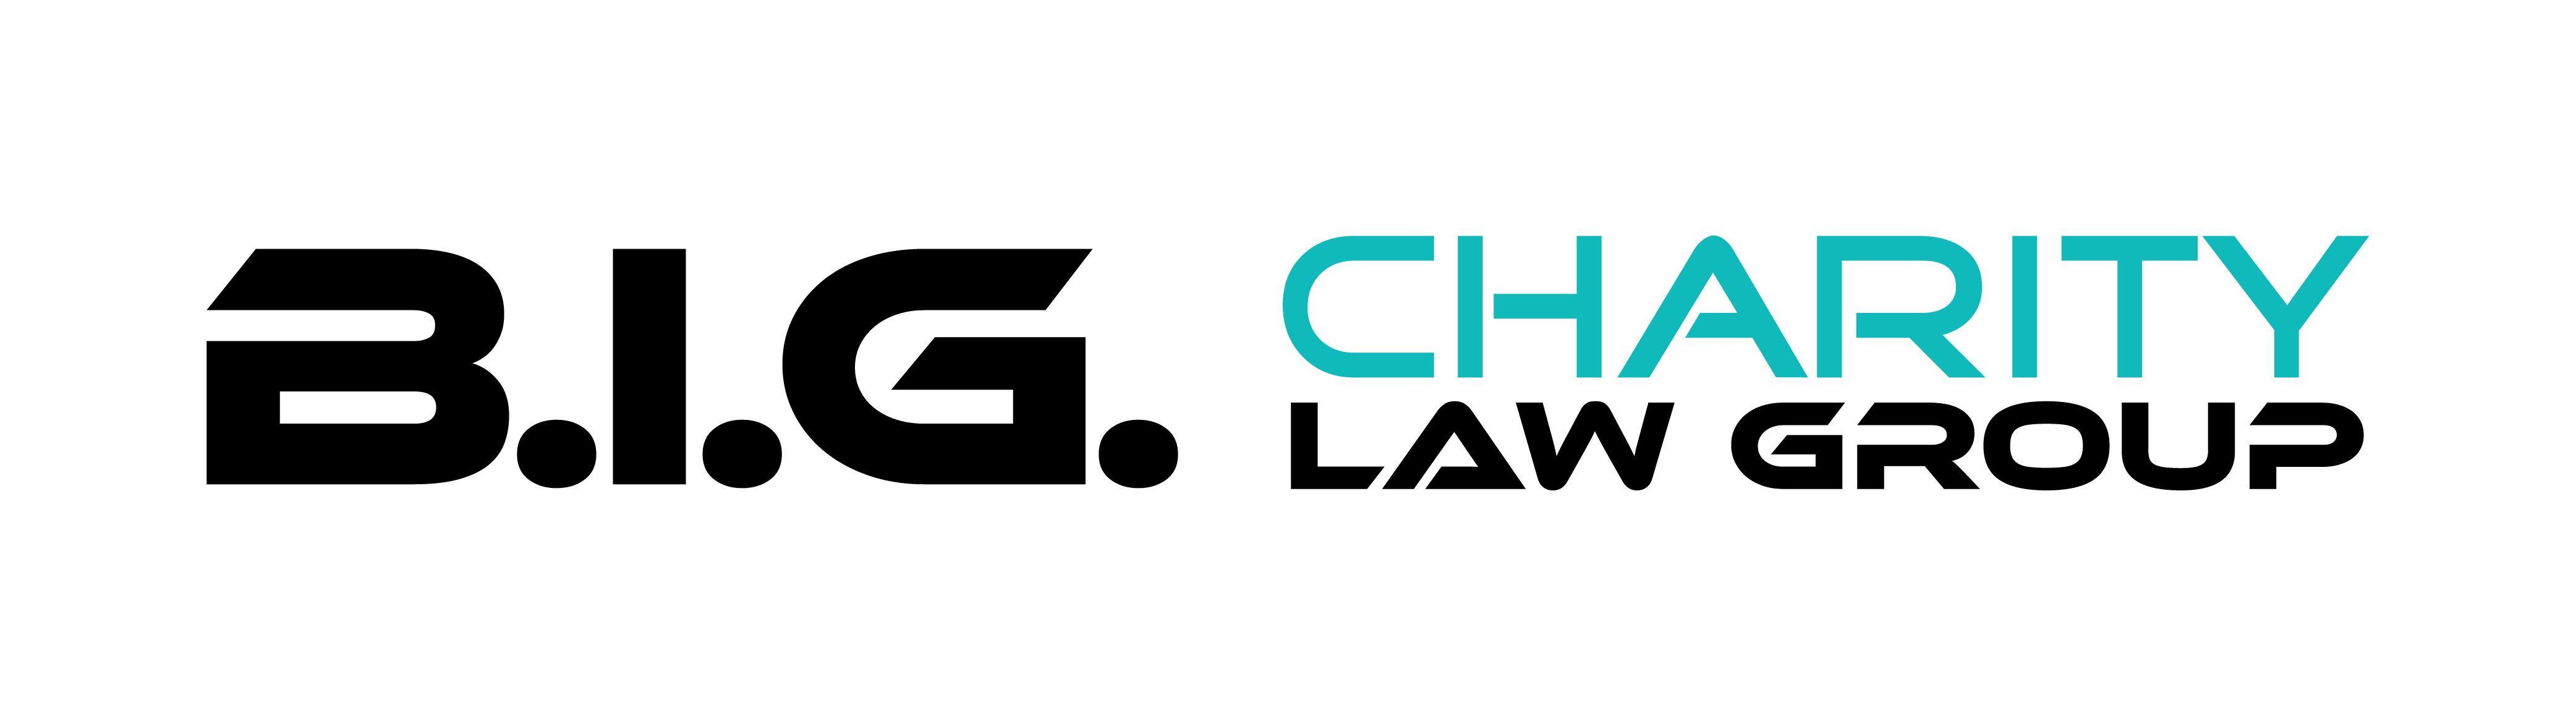 B.I.G. Charity Law Group